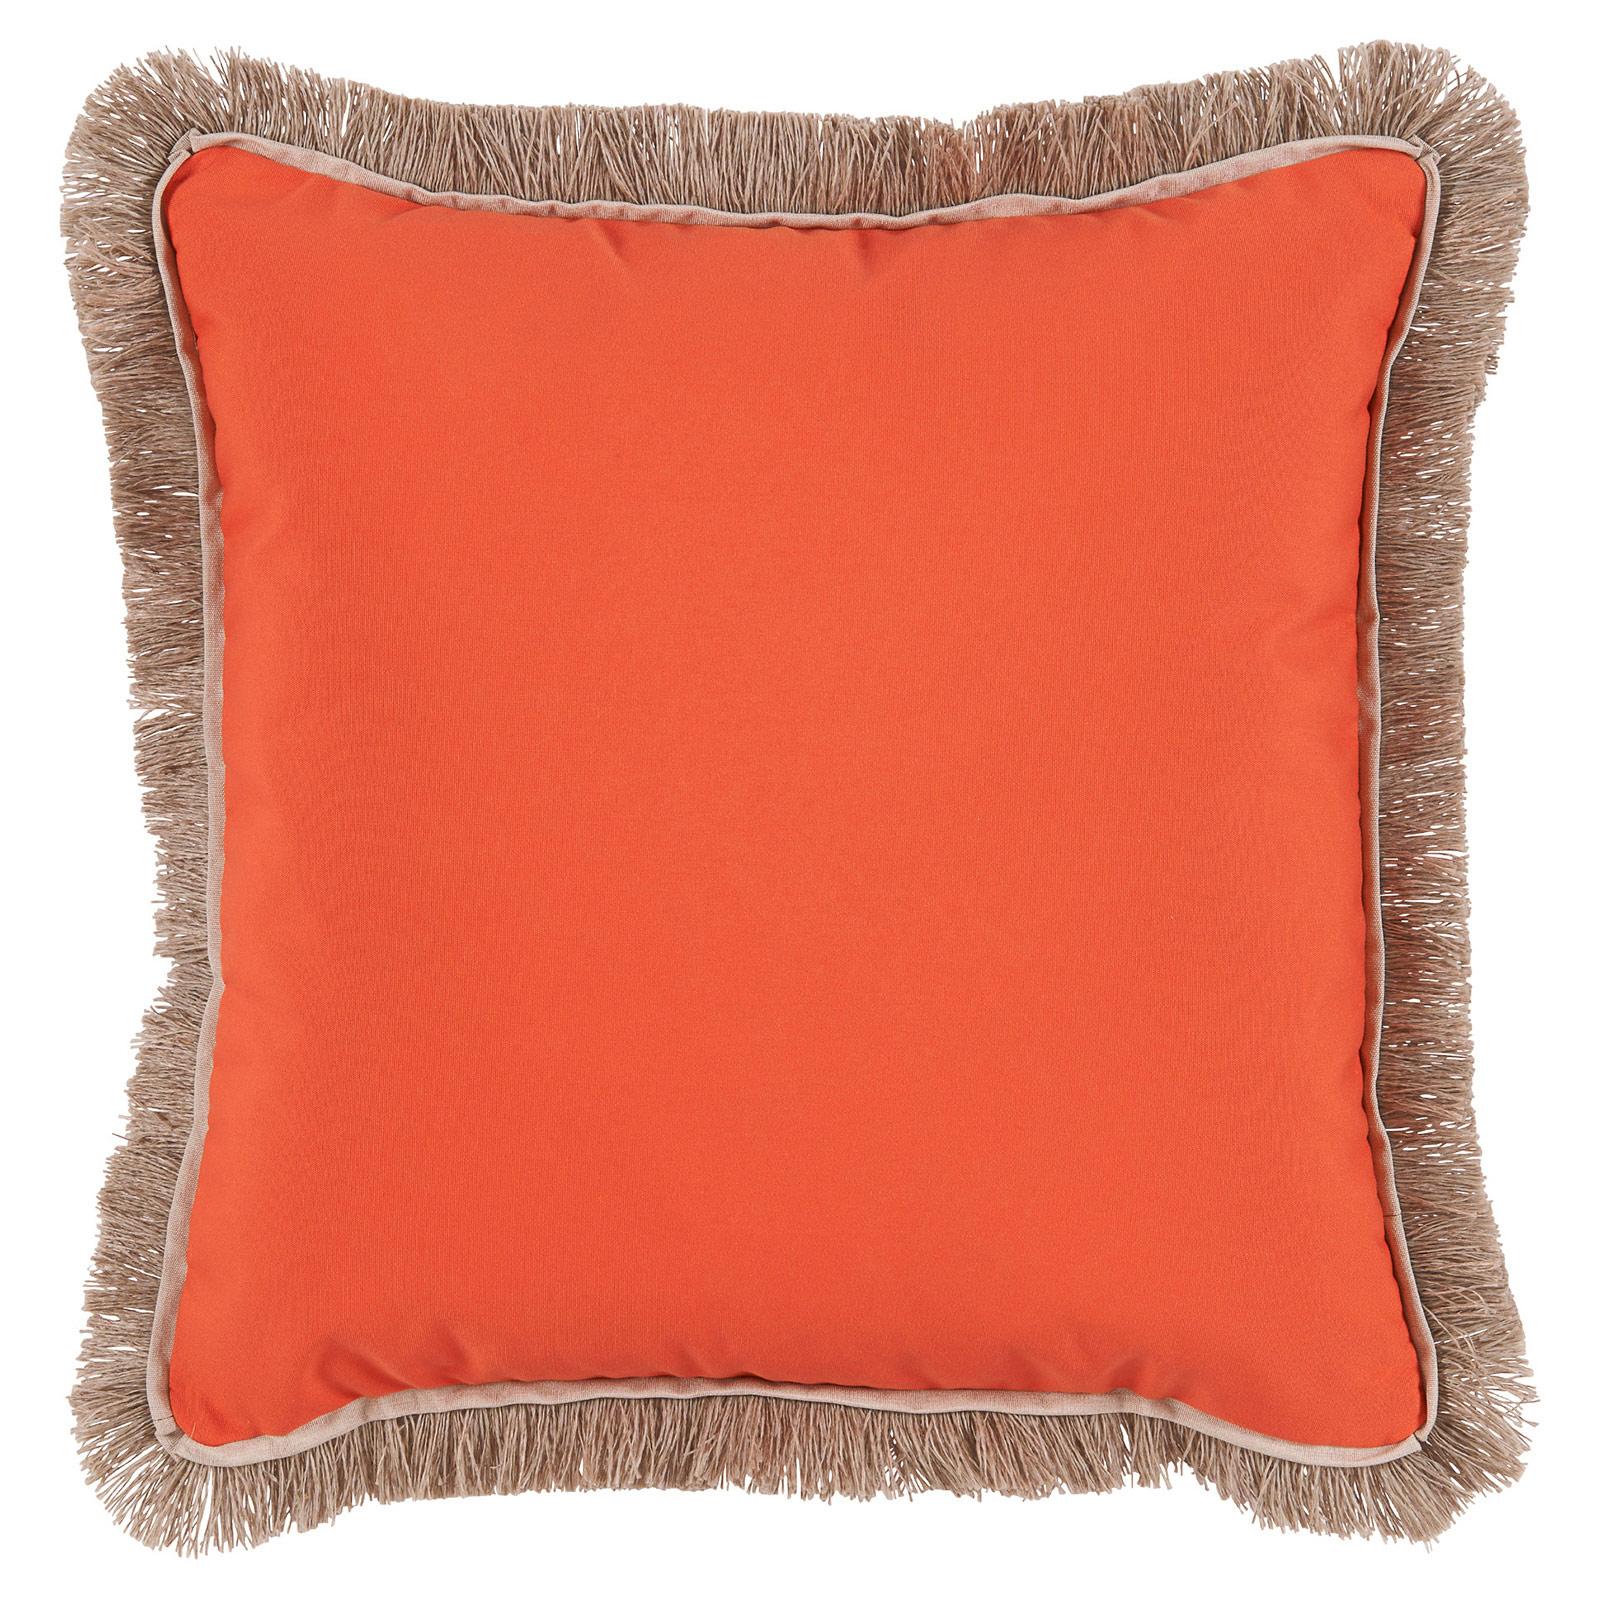 Talli Regency Fringe Orange Outdoor Pillow - 20x20